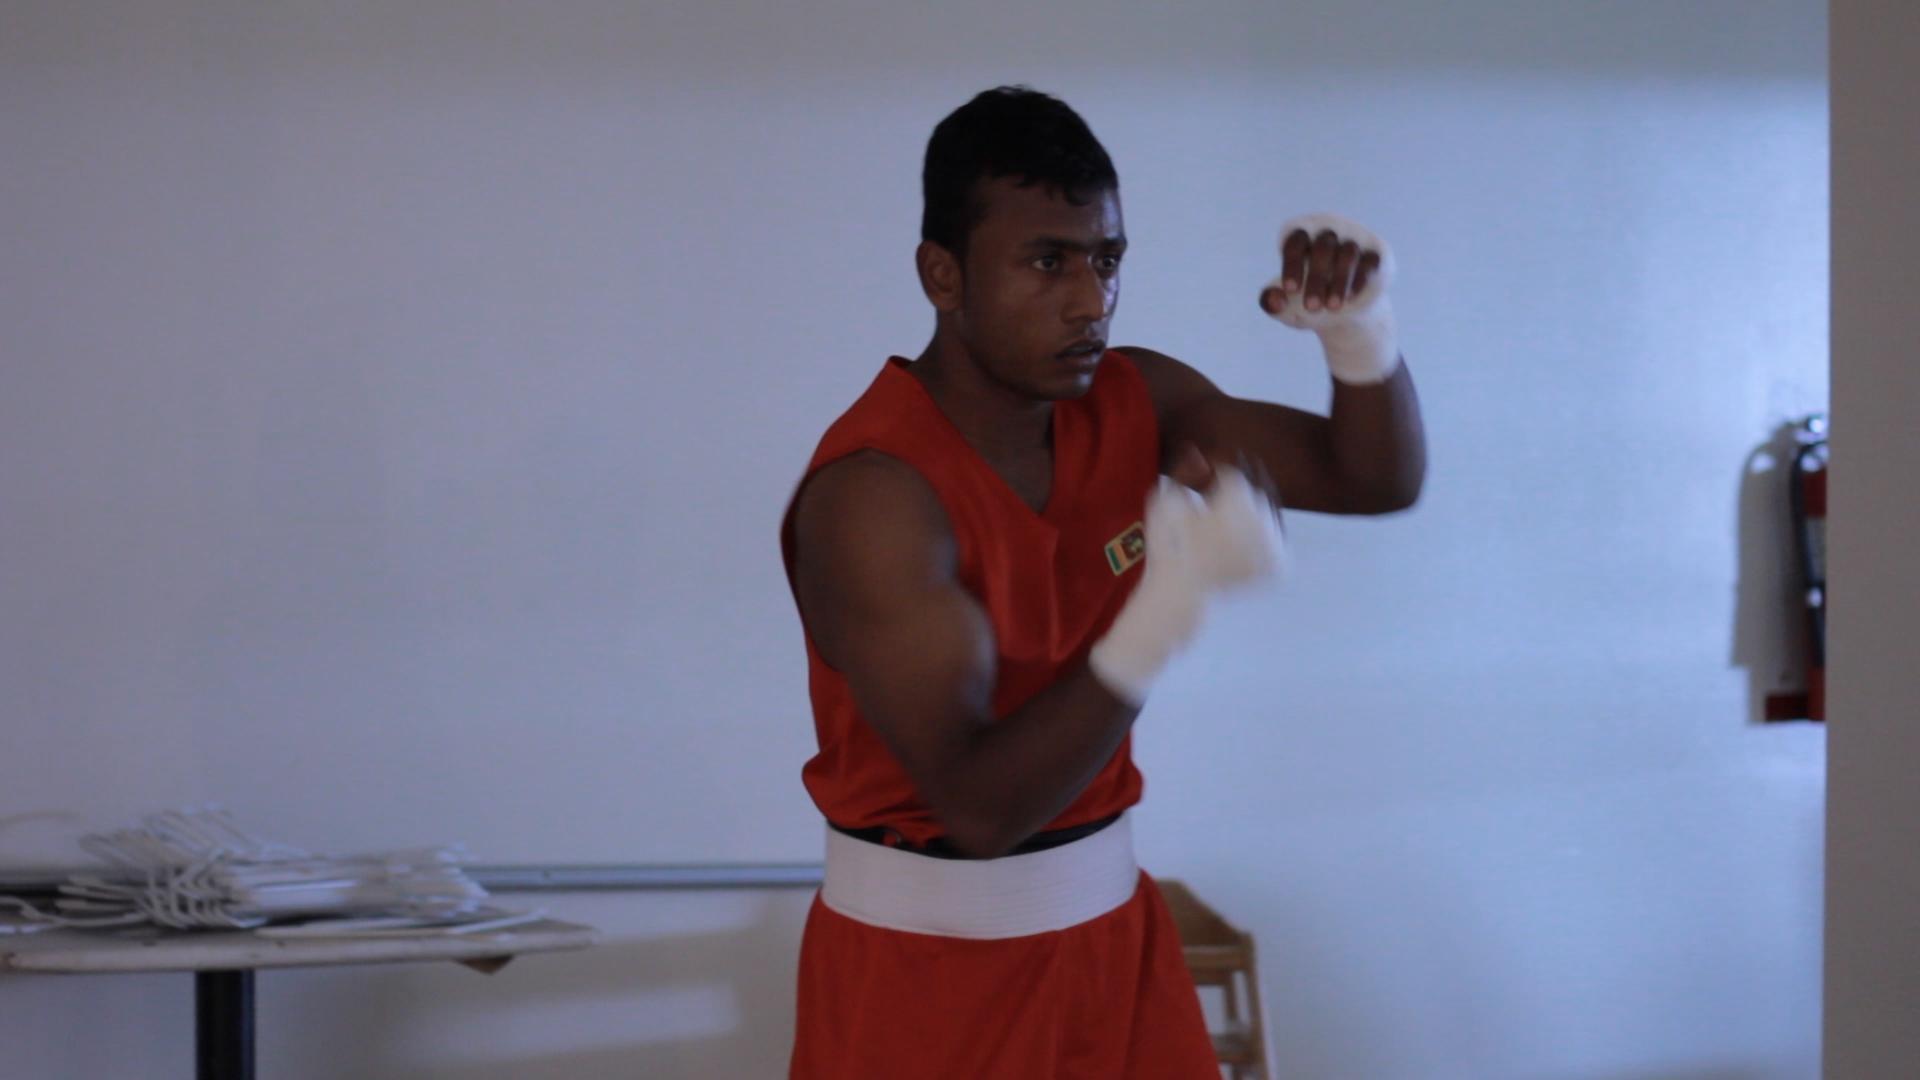 A Boxer at the Races (2012) Digital Videographer, Editor LA Boxing  https://vimeo.com/52147494